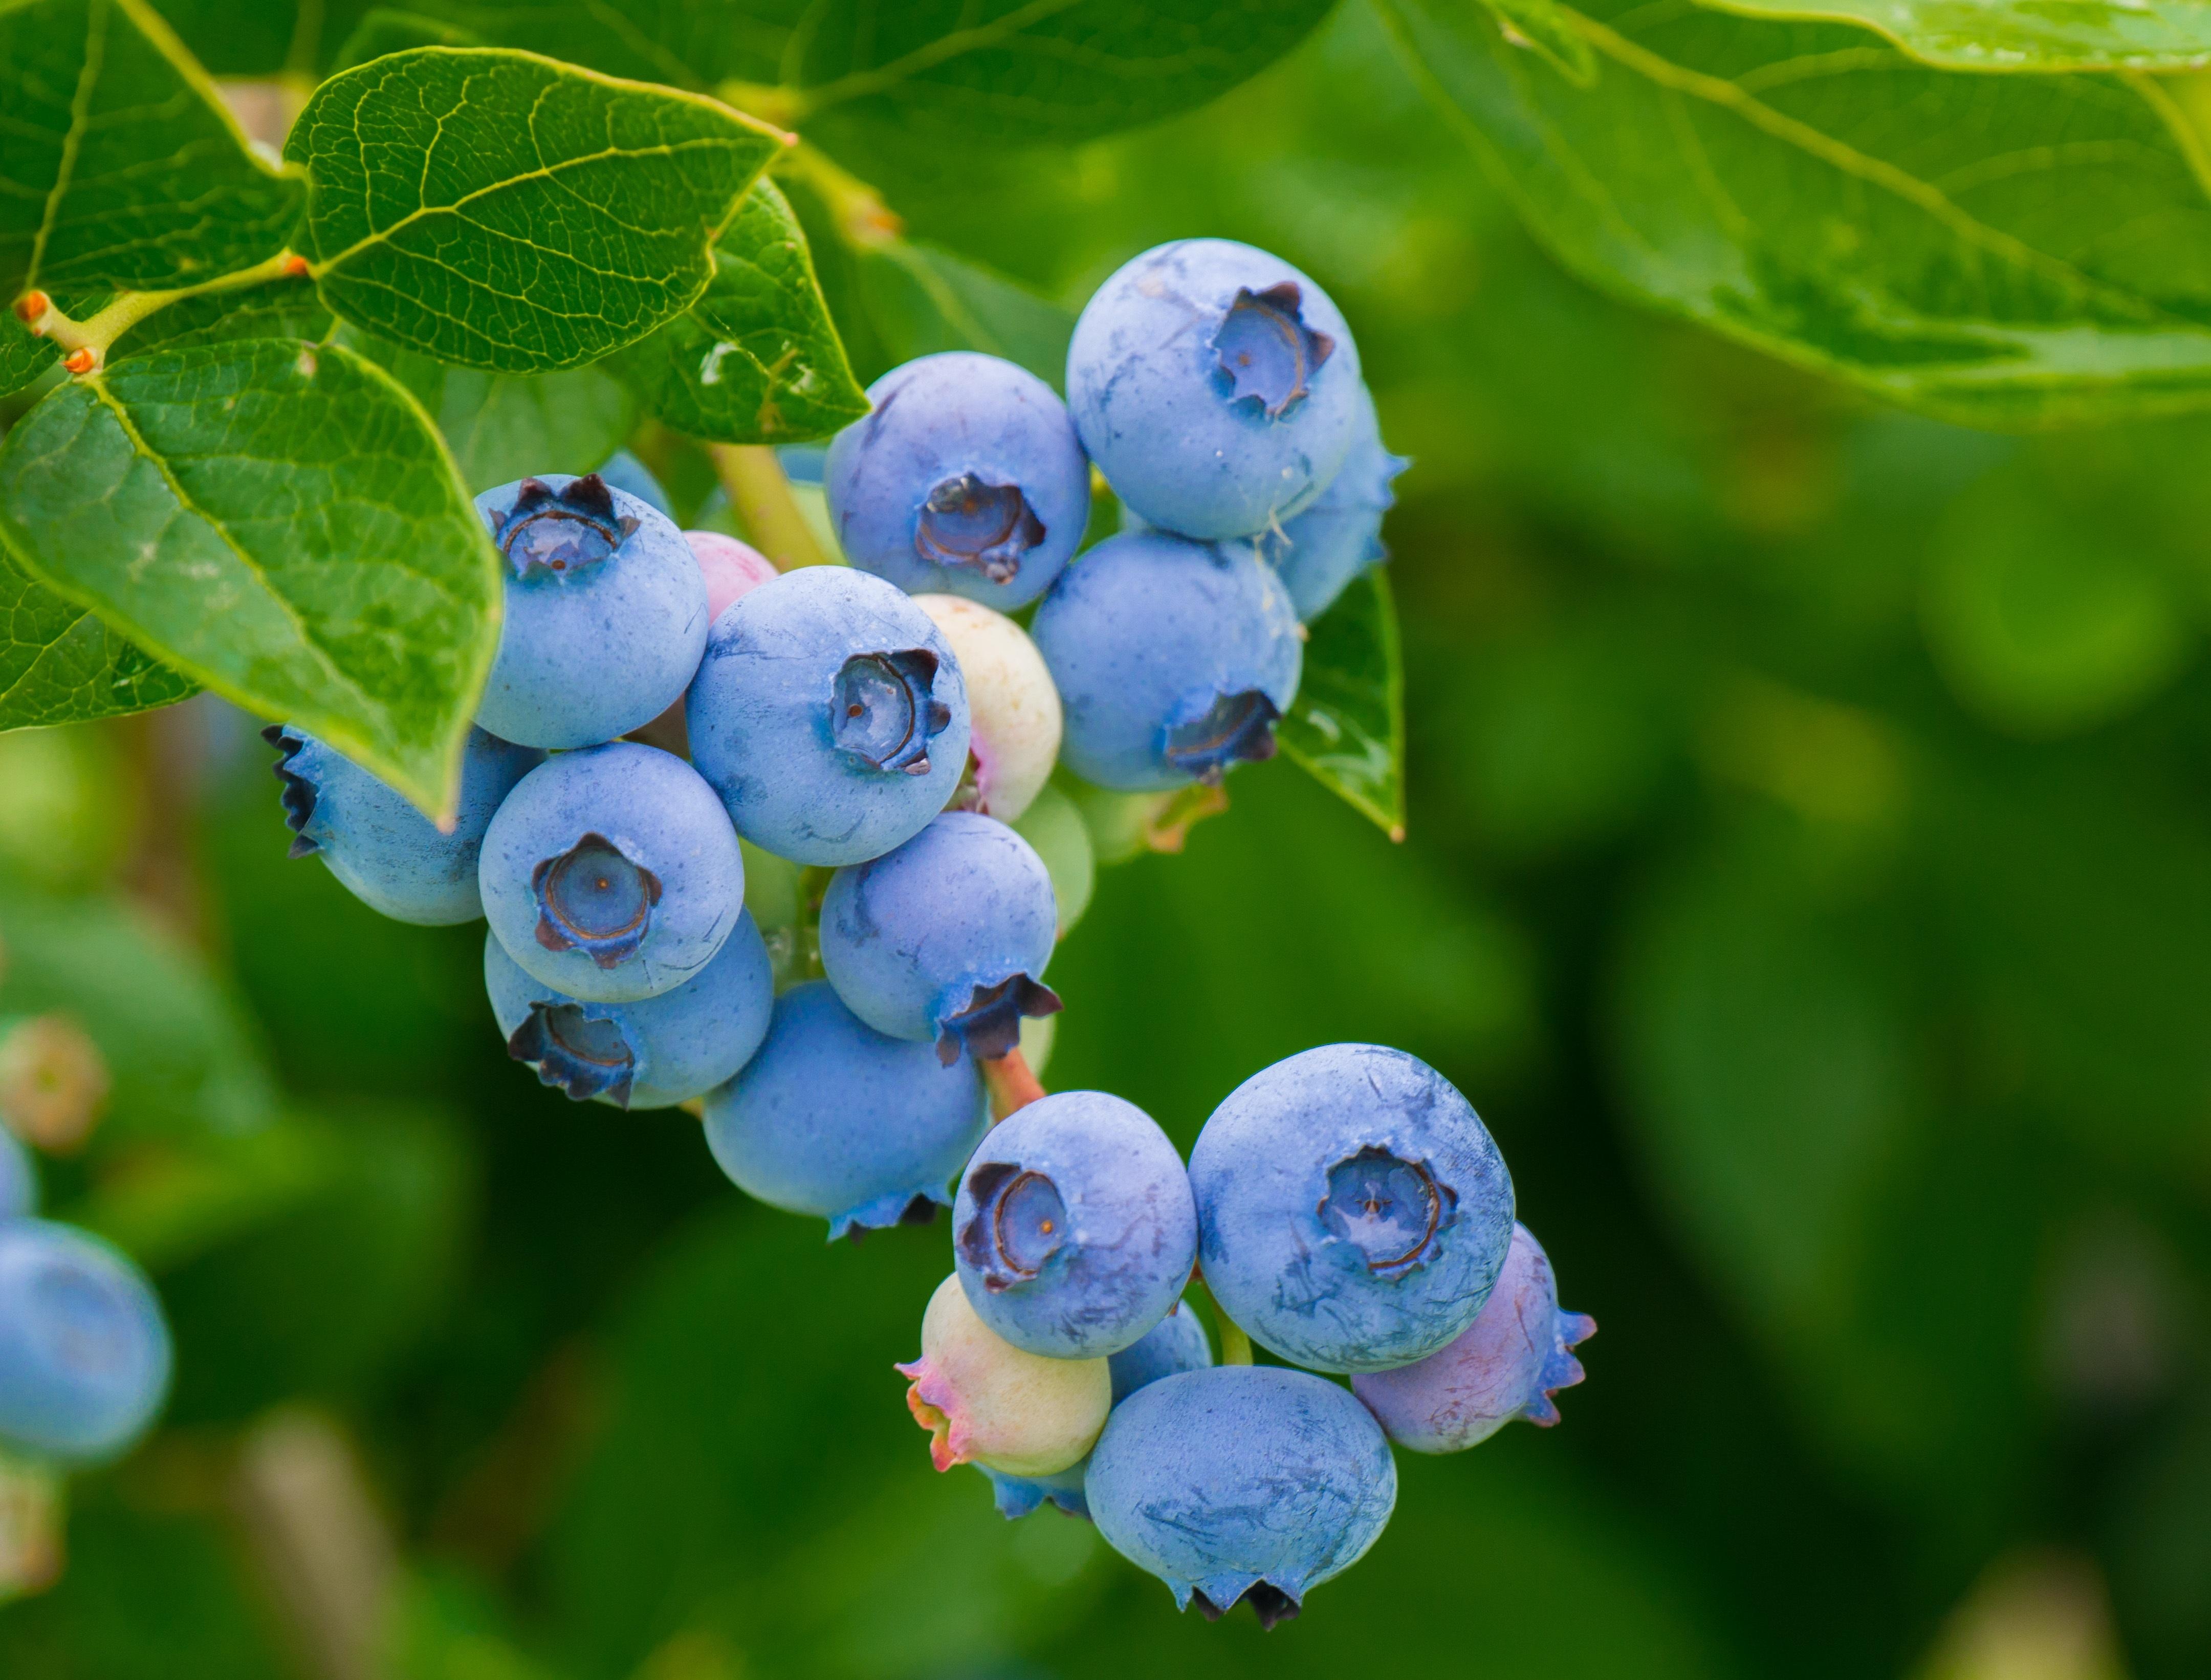 Blueberries-3548239